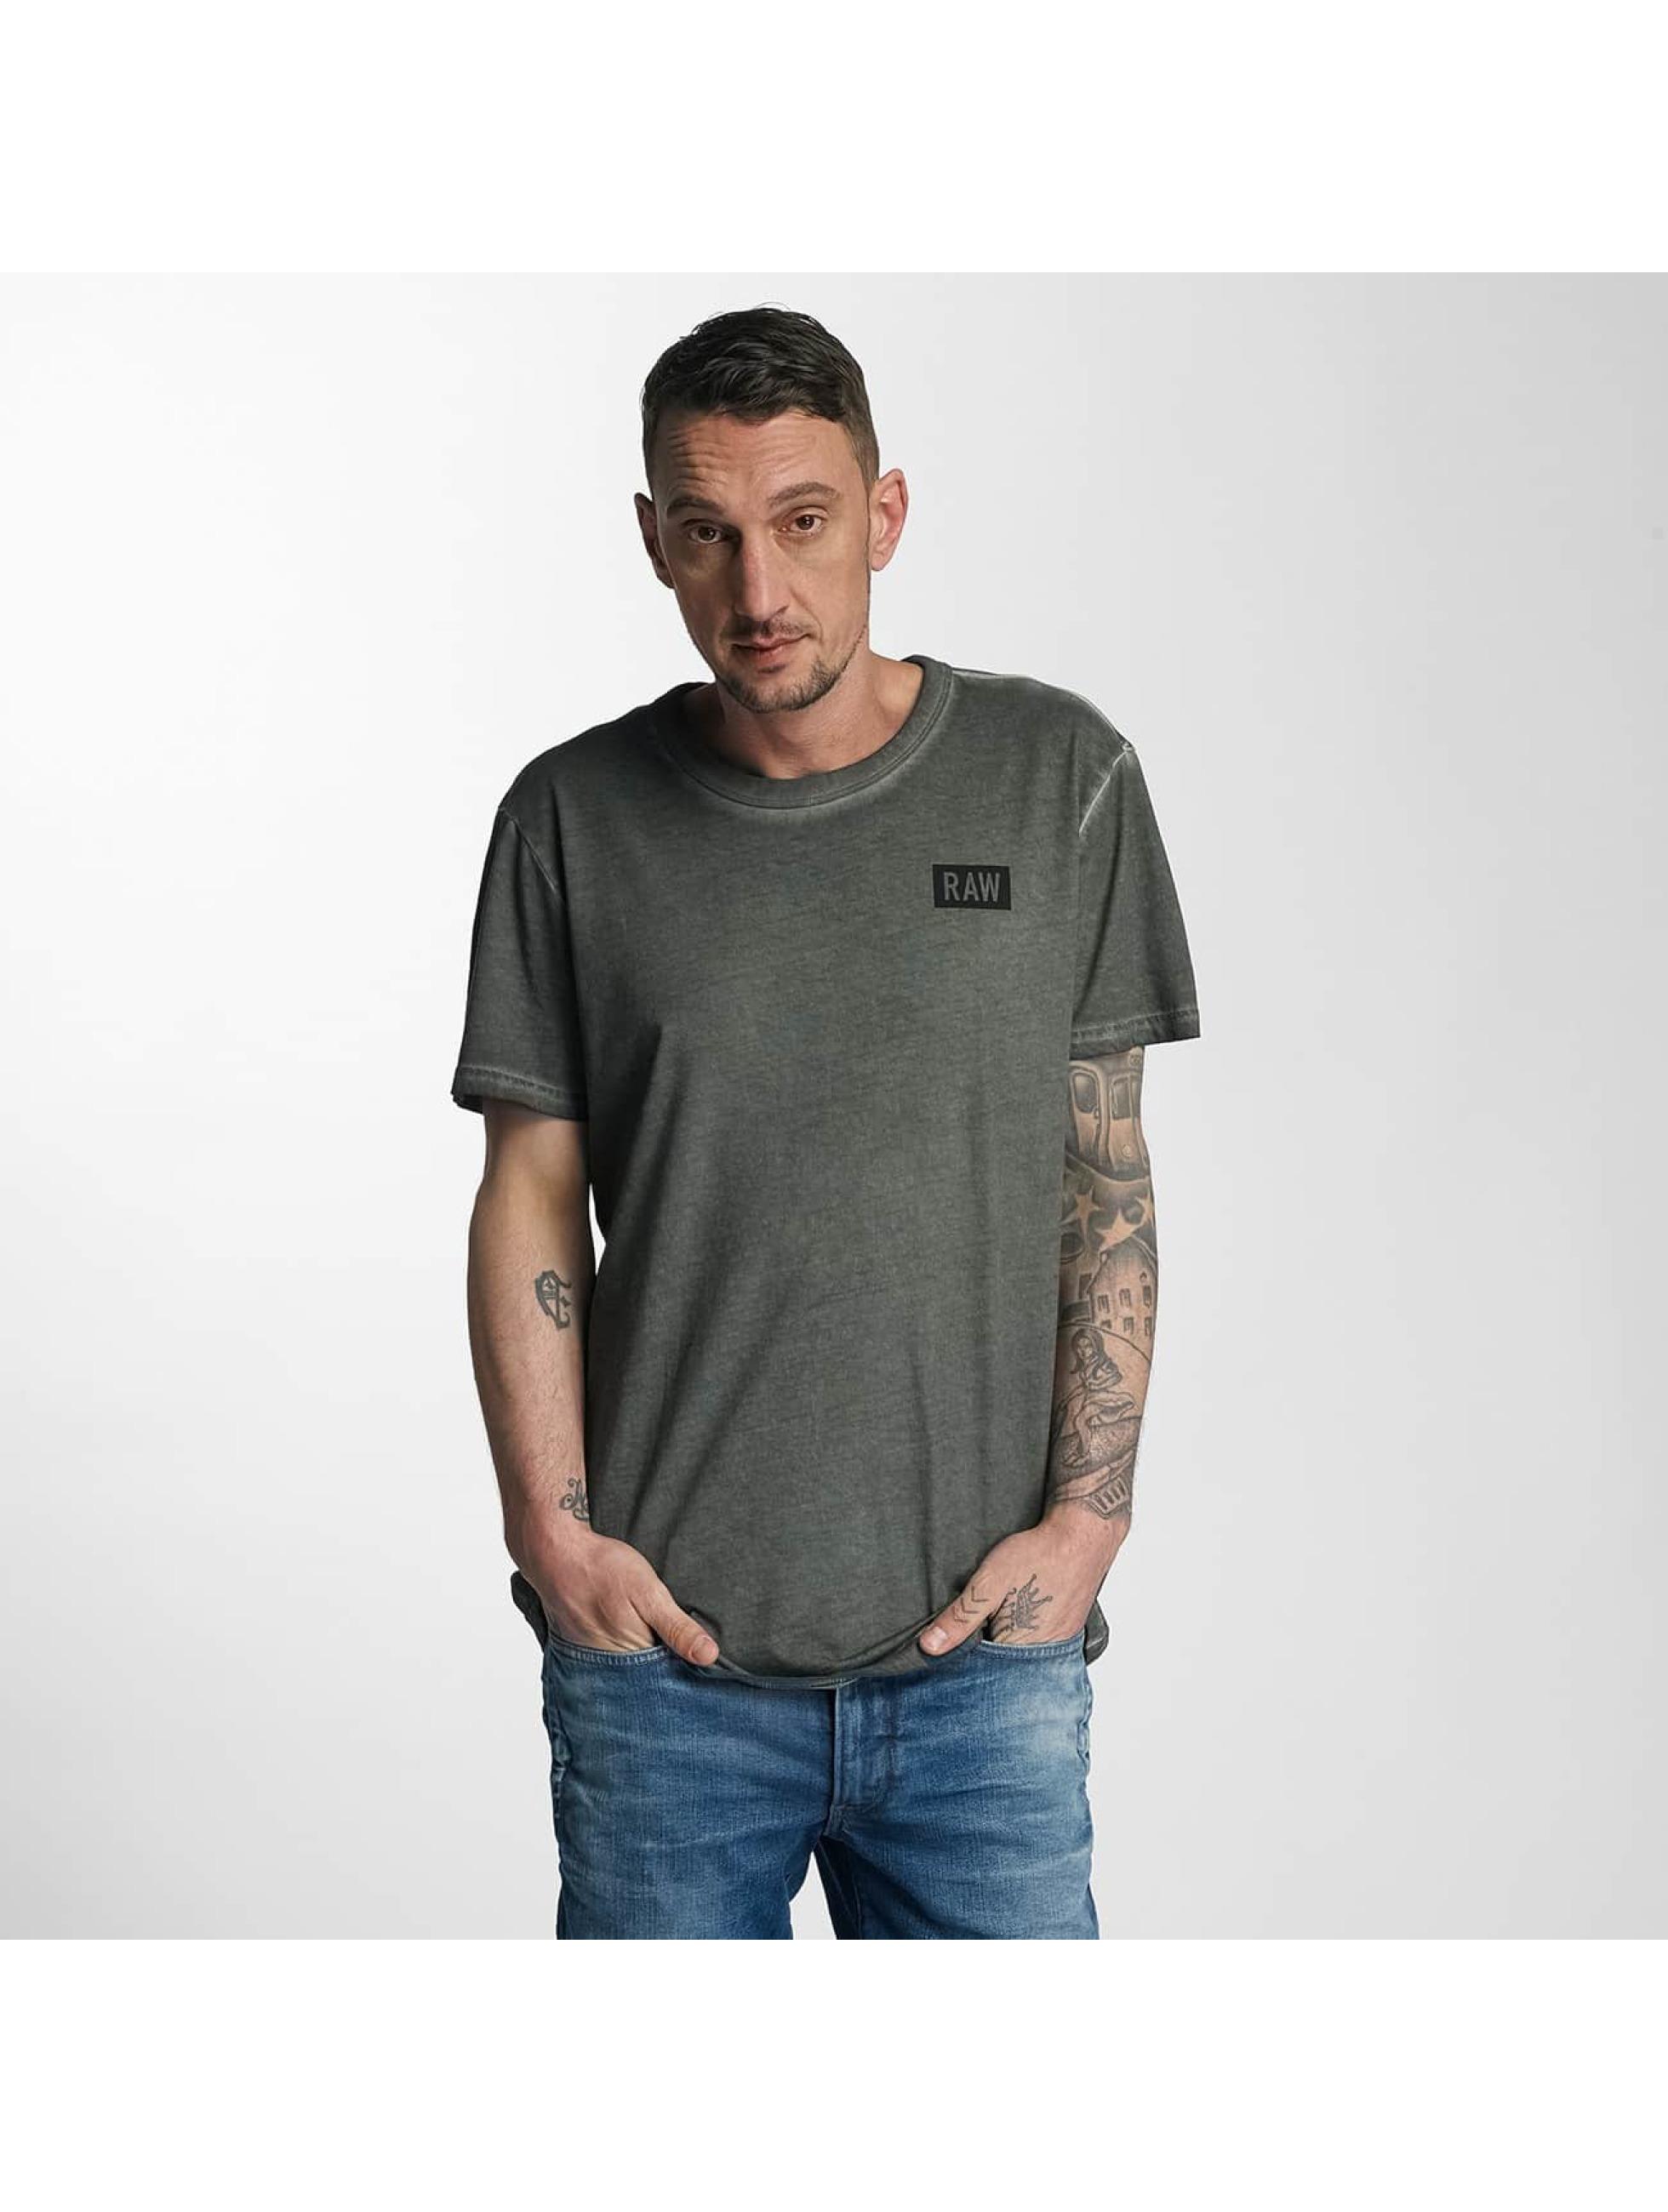 G-Star Männer T-Shirt Navas Youn in grün